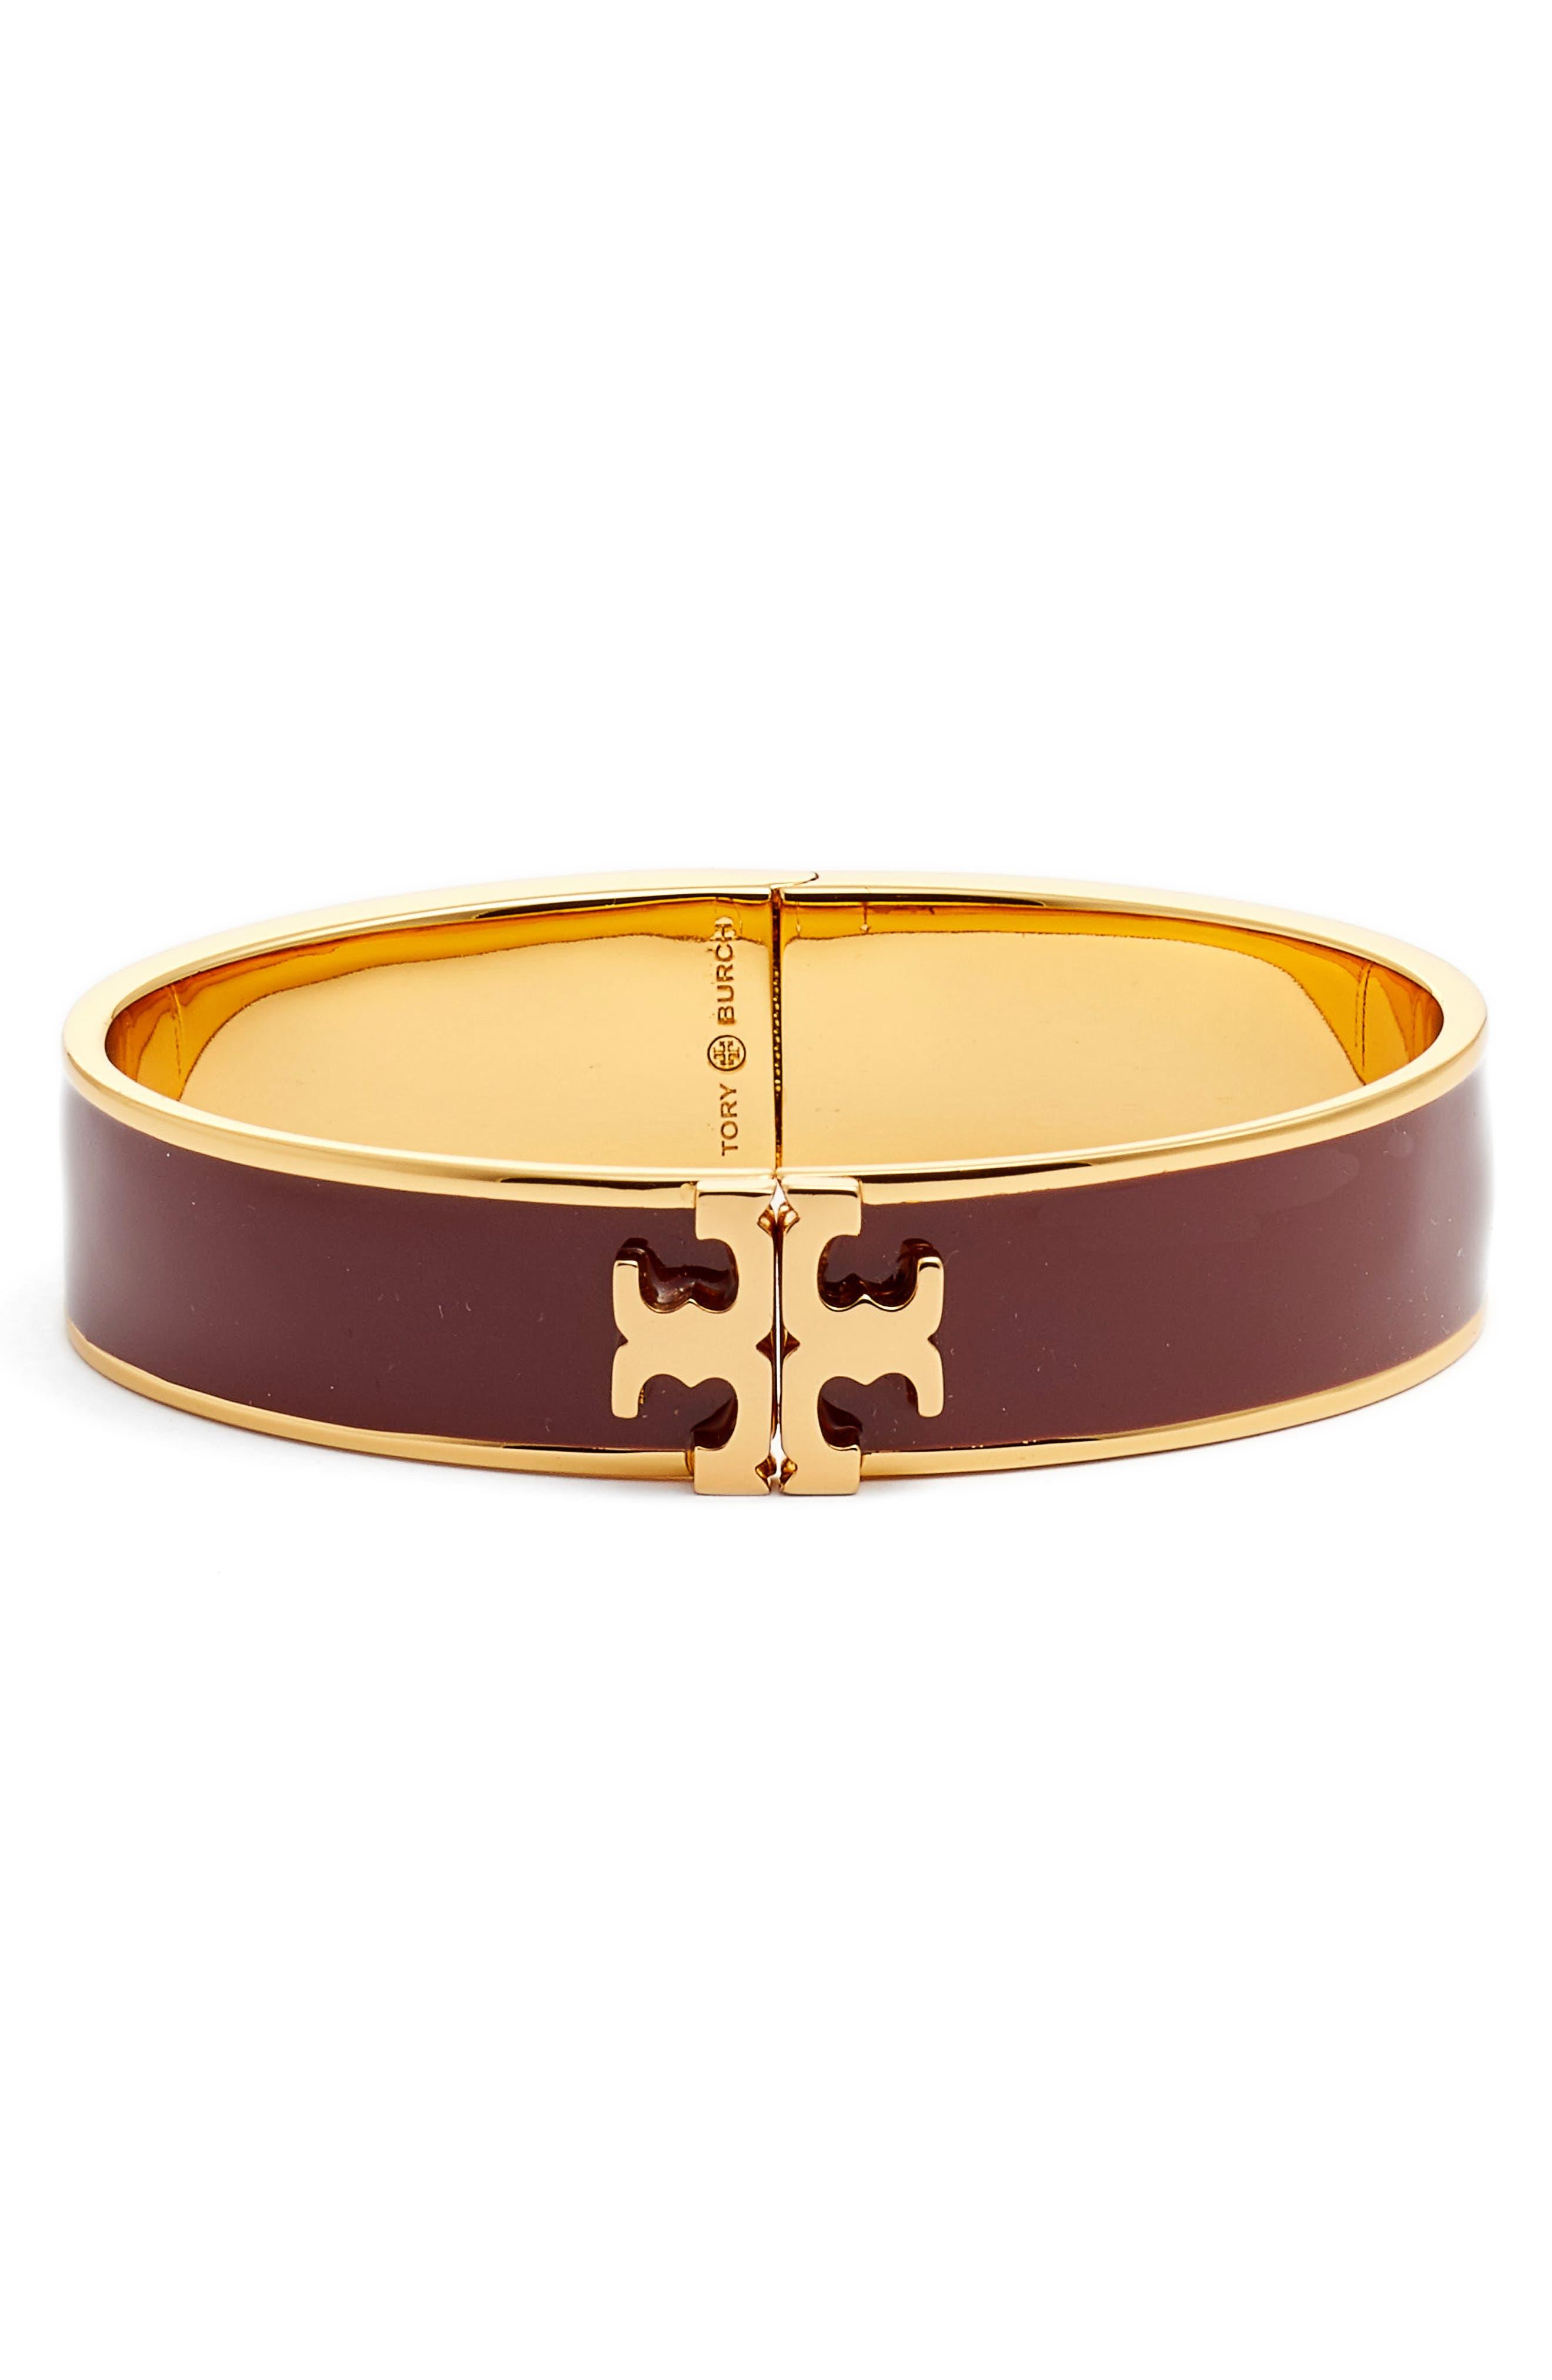 Alternate Image 1 Selected - Tory Burch Raised Logo Enamel Hinge Bracelet